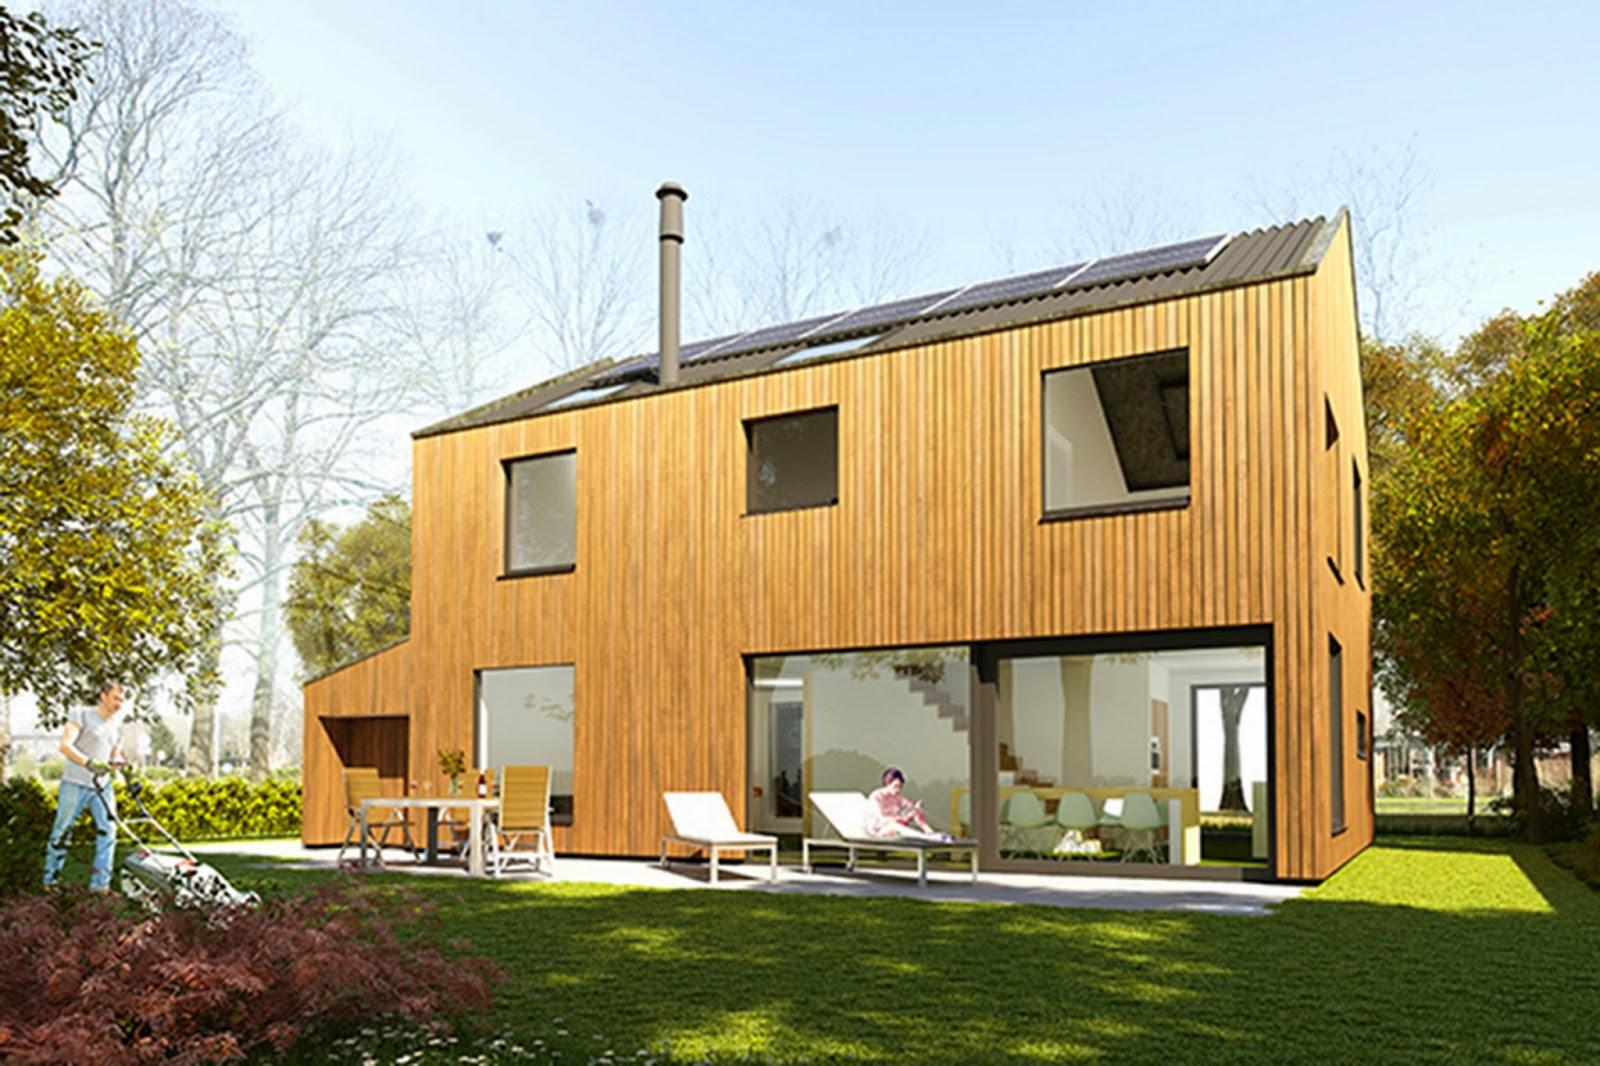 VT wonen duurzame houtskeletbouw woning